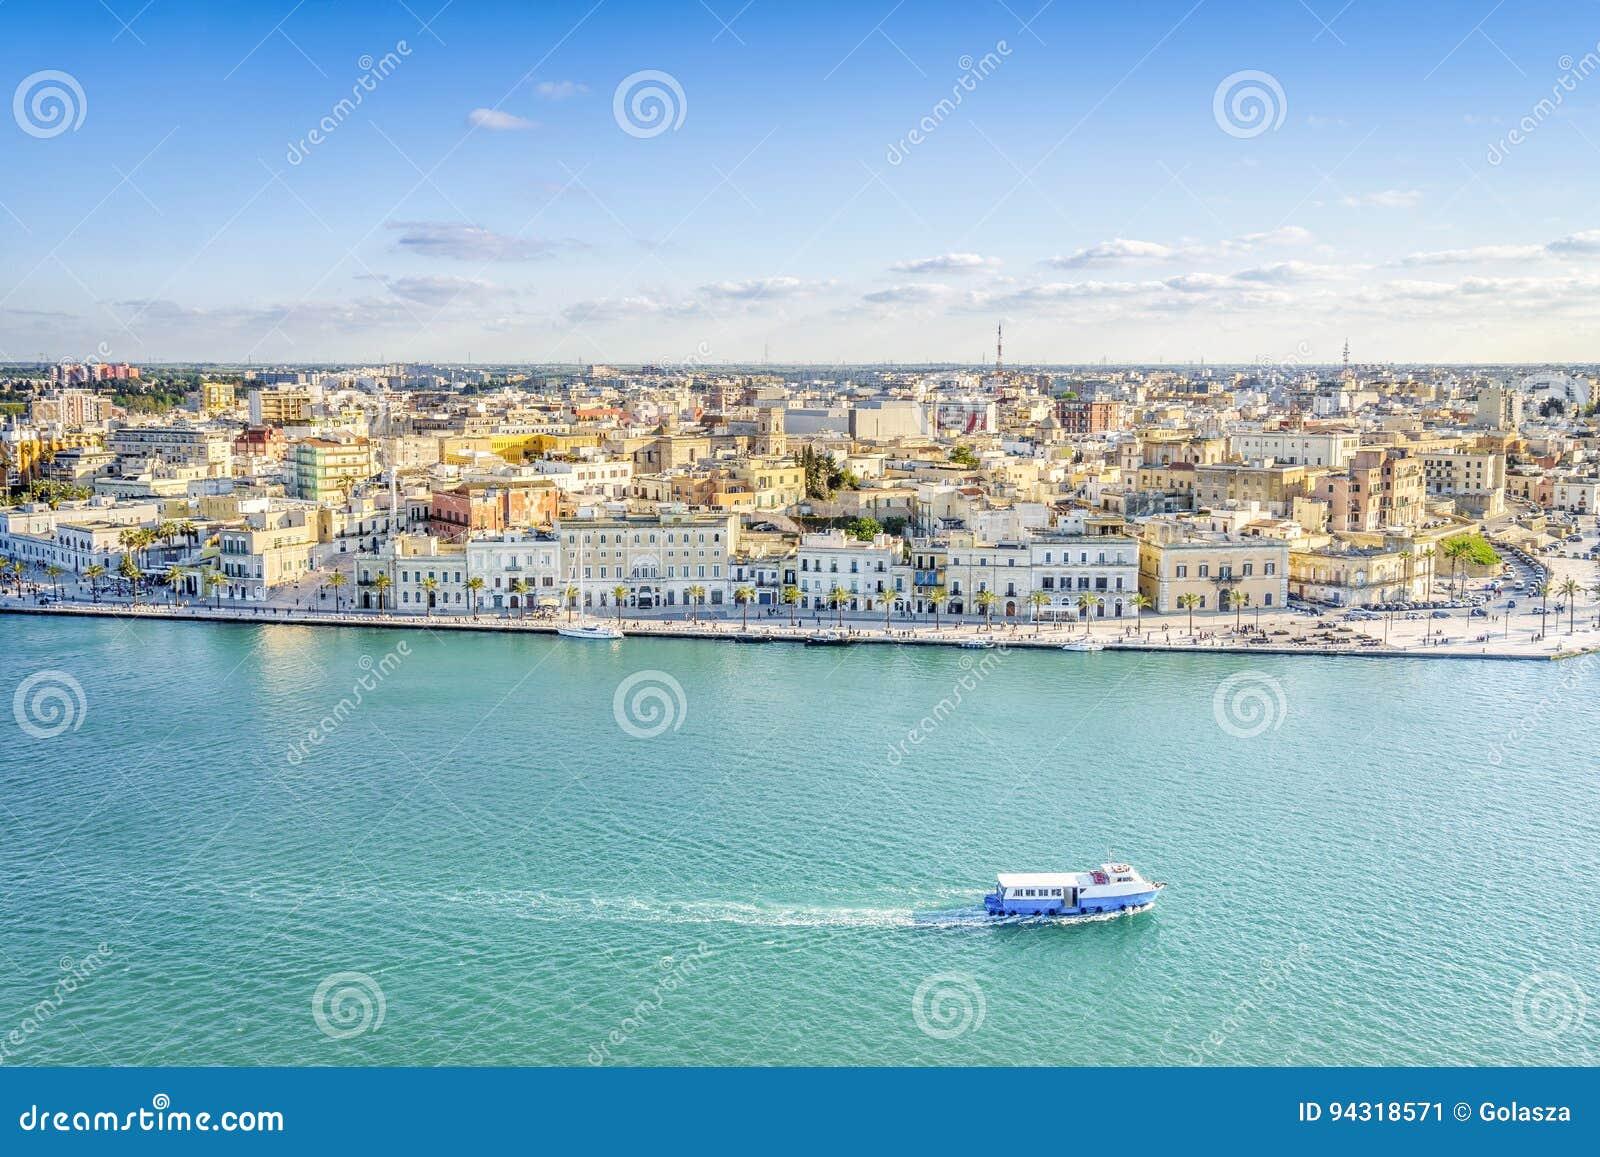 Flyg- panorama av Brindisi, Puglia, Italien